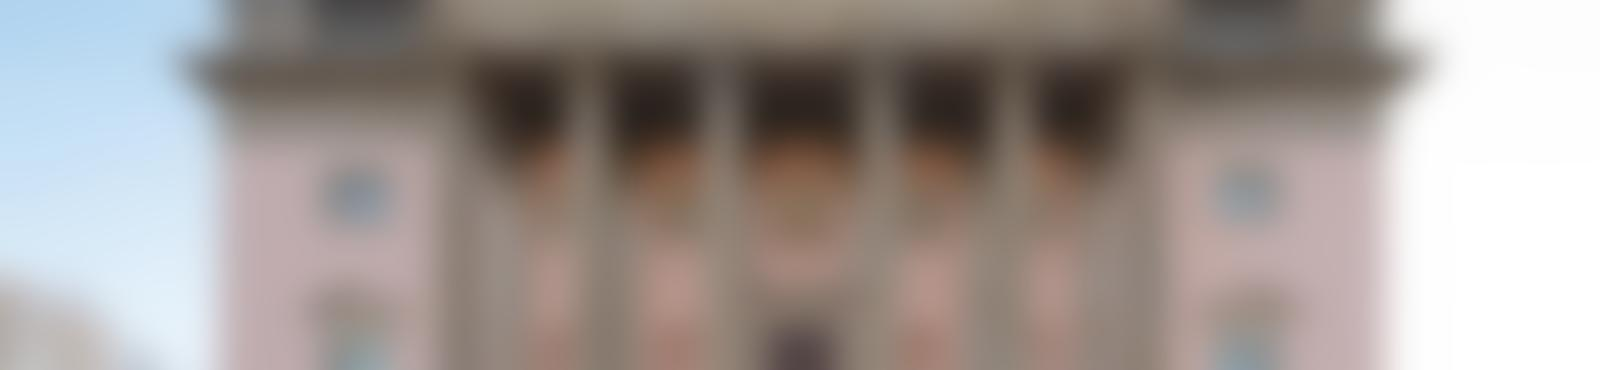 Blurred b67f40fc 7fc7 468e 8f44 fe161de44244